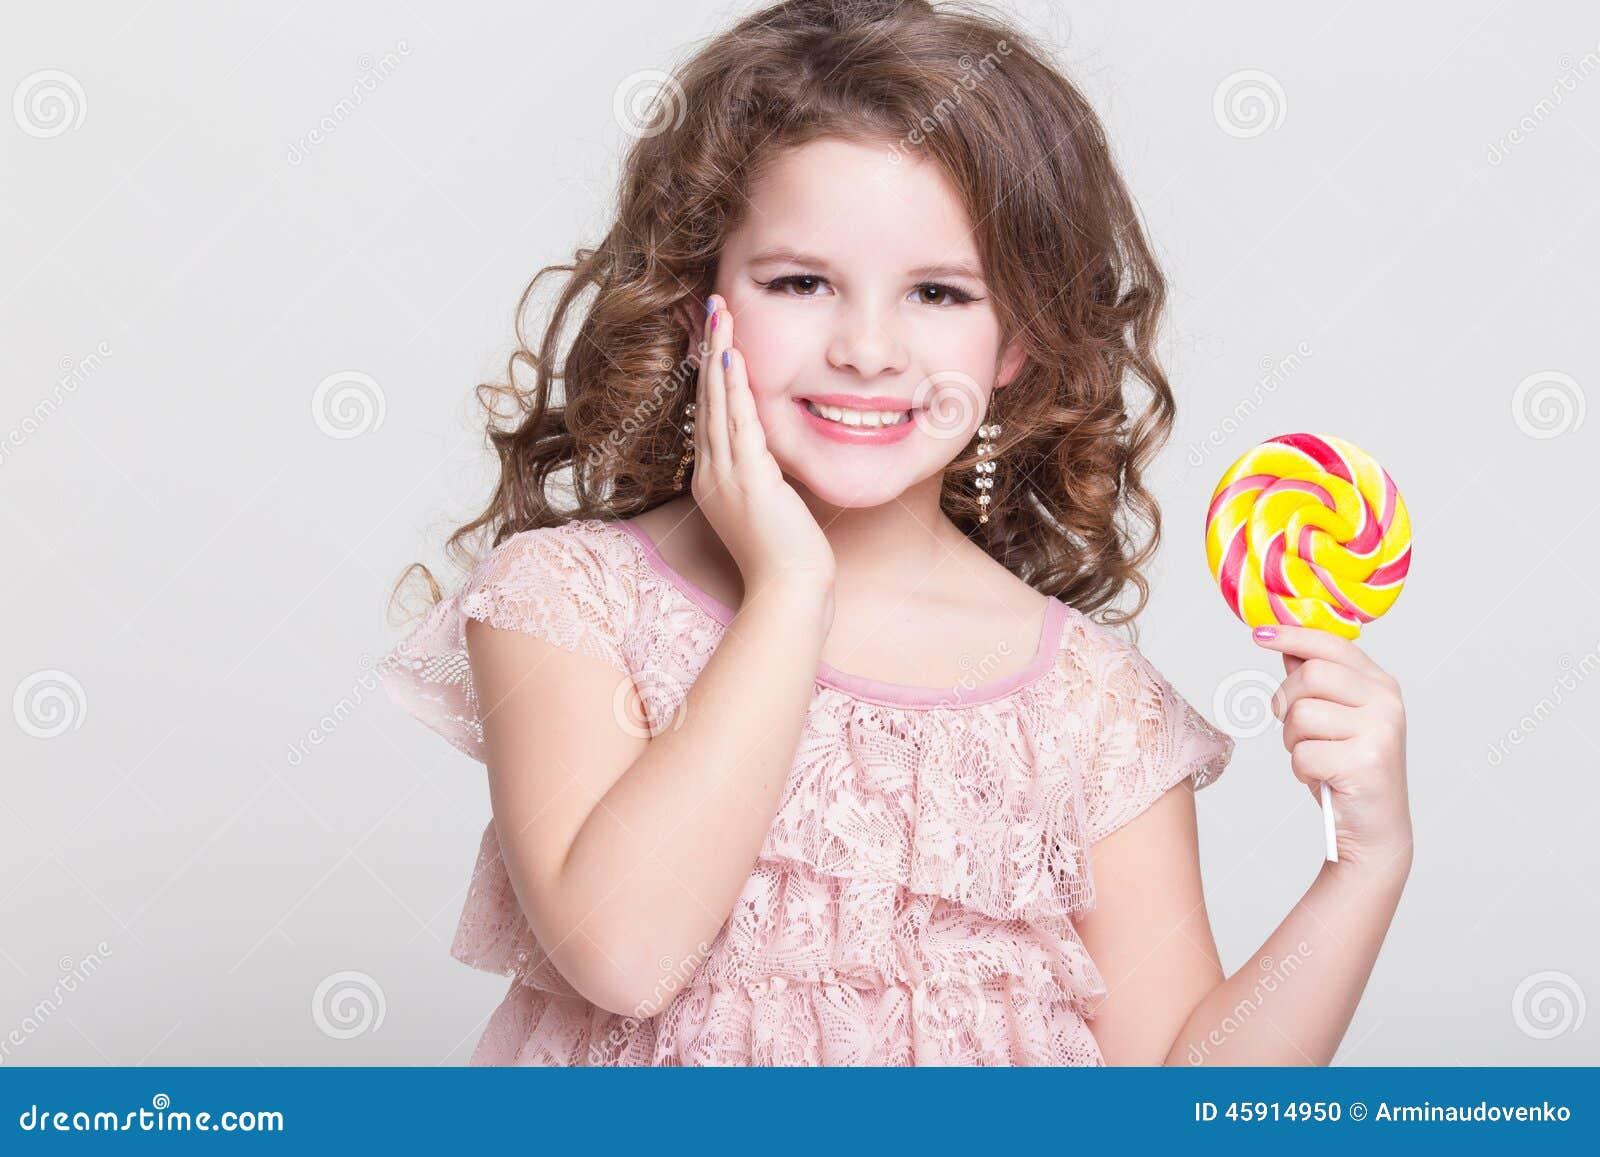 little_sugar